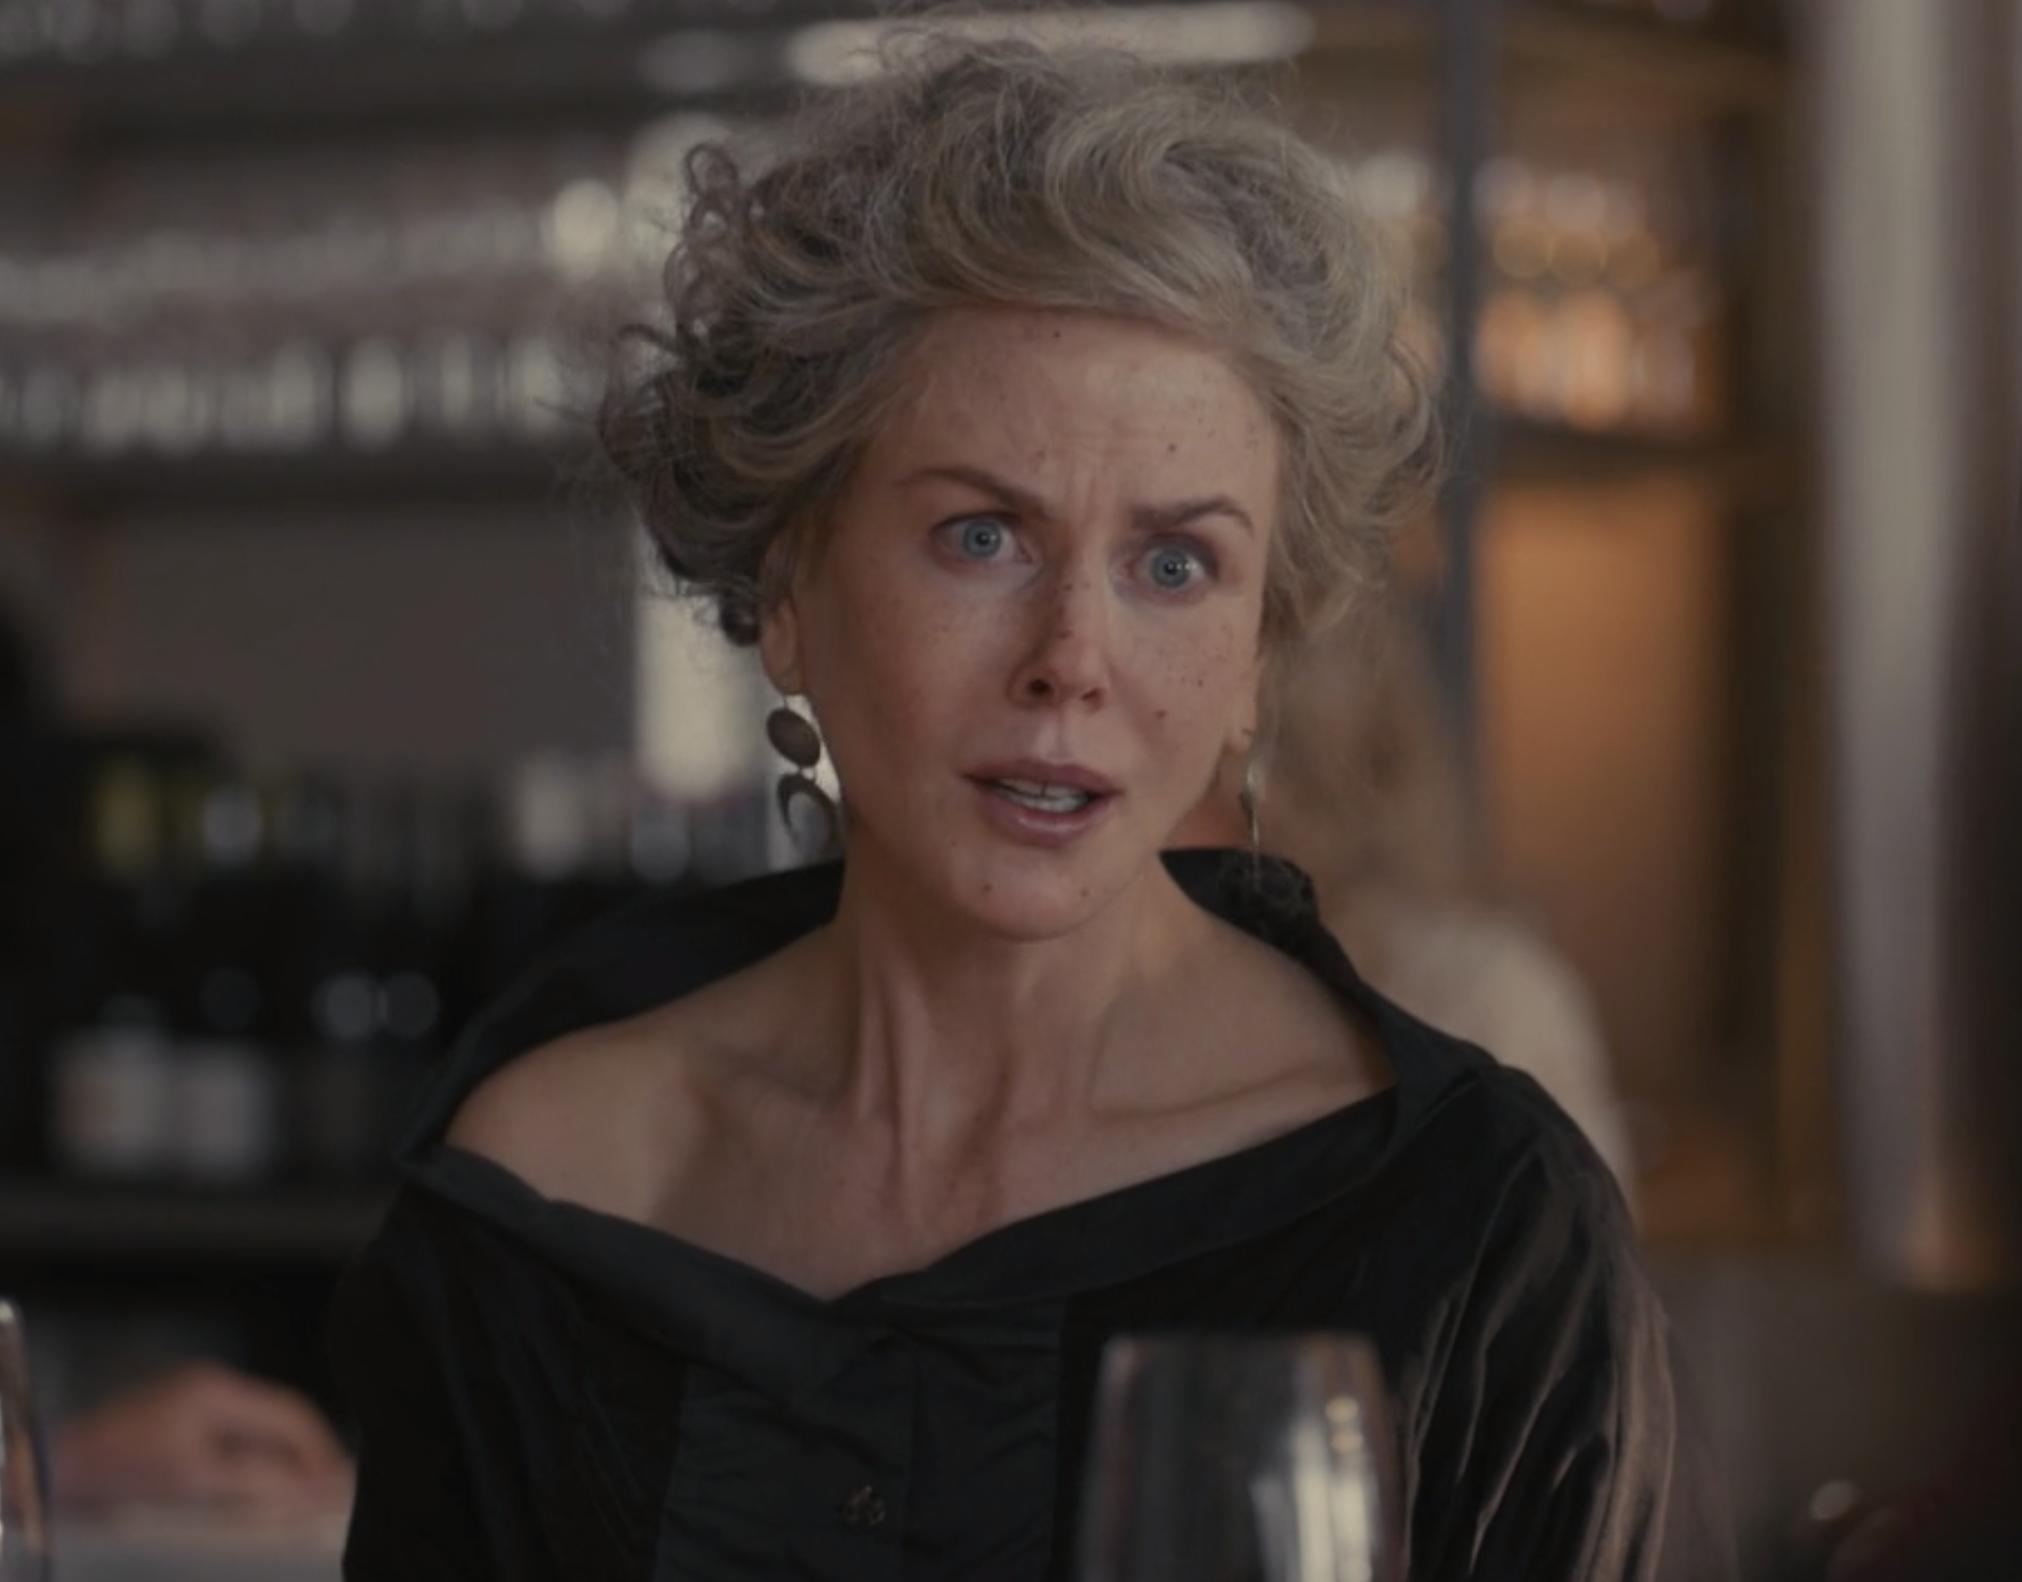 Nicole Kidman wearing a flimsy gray wig